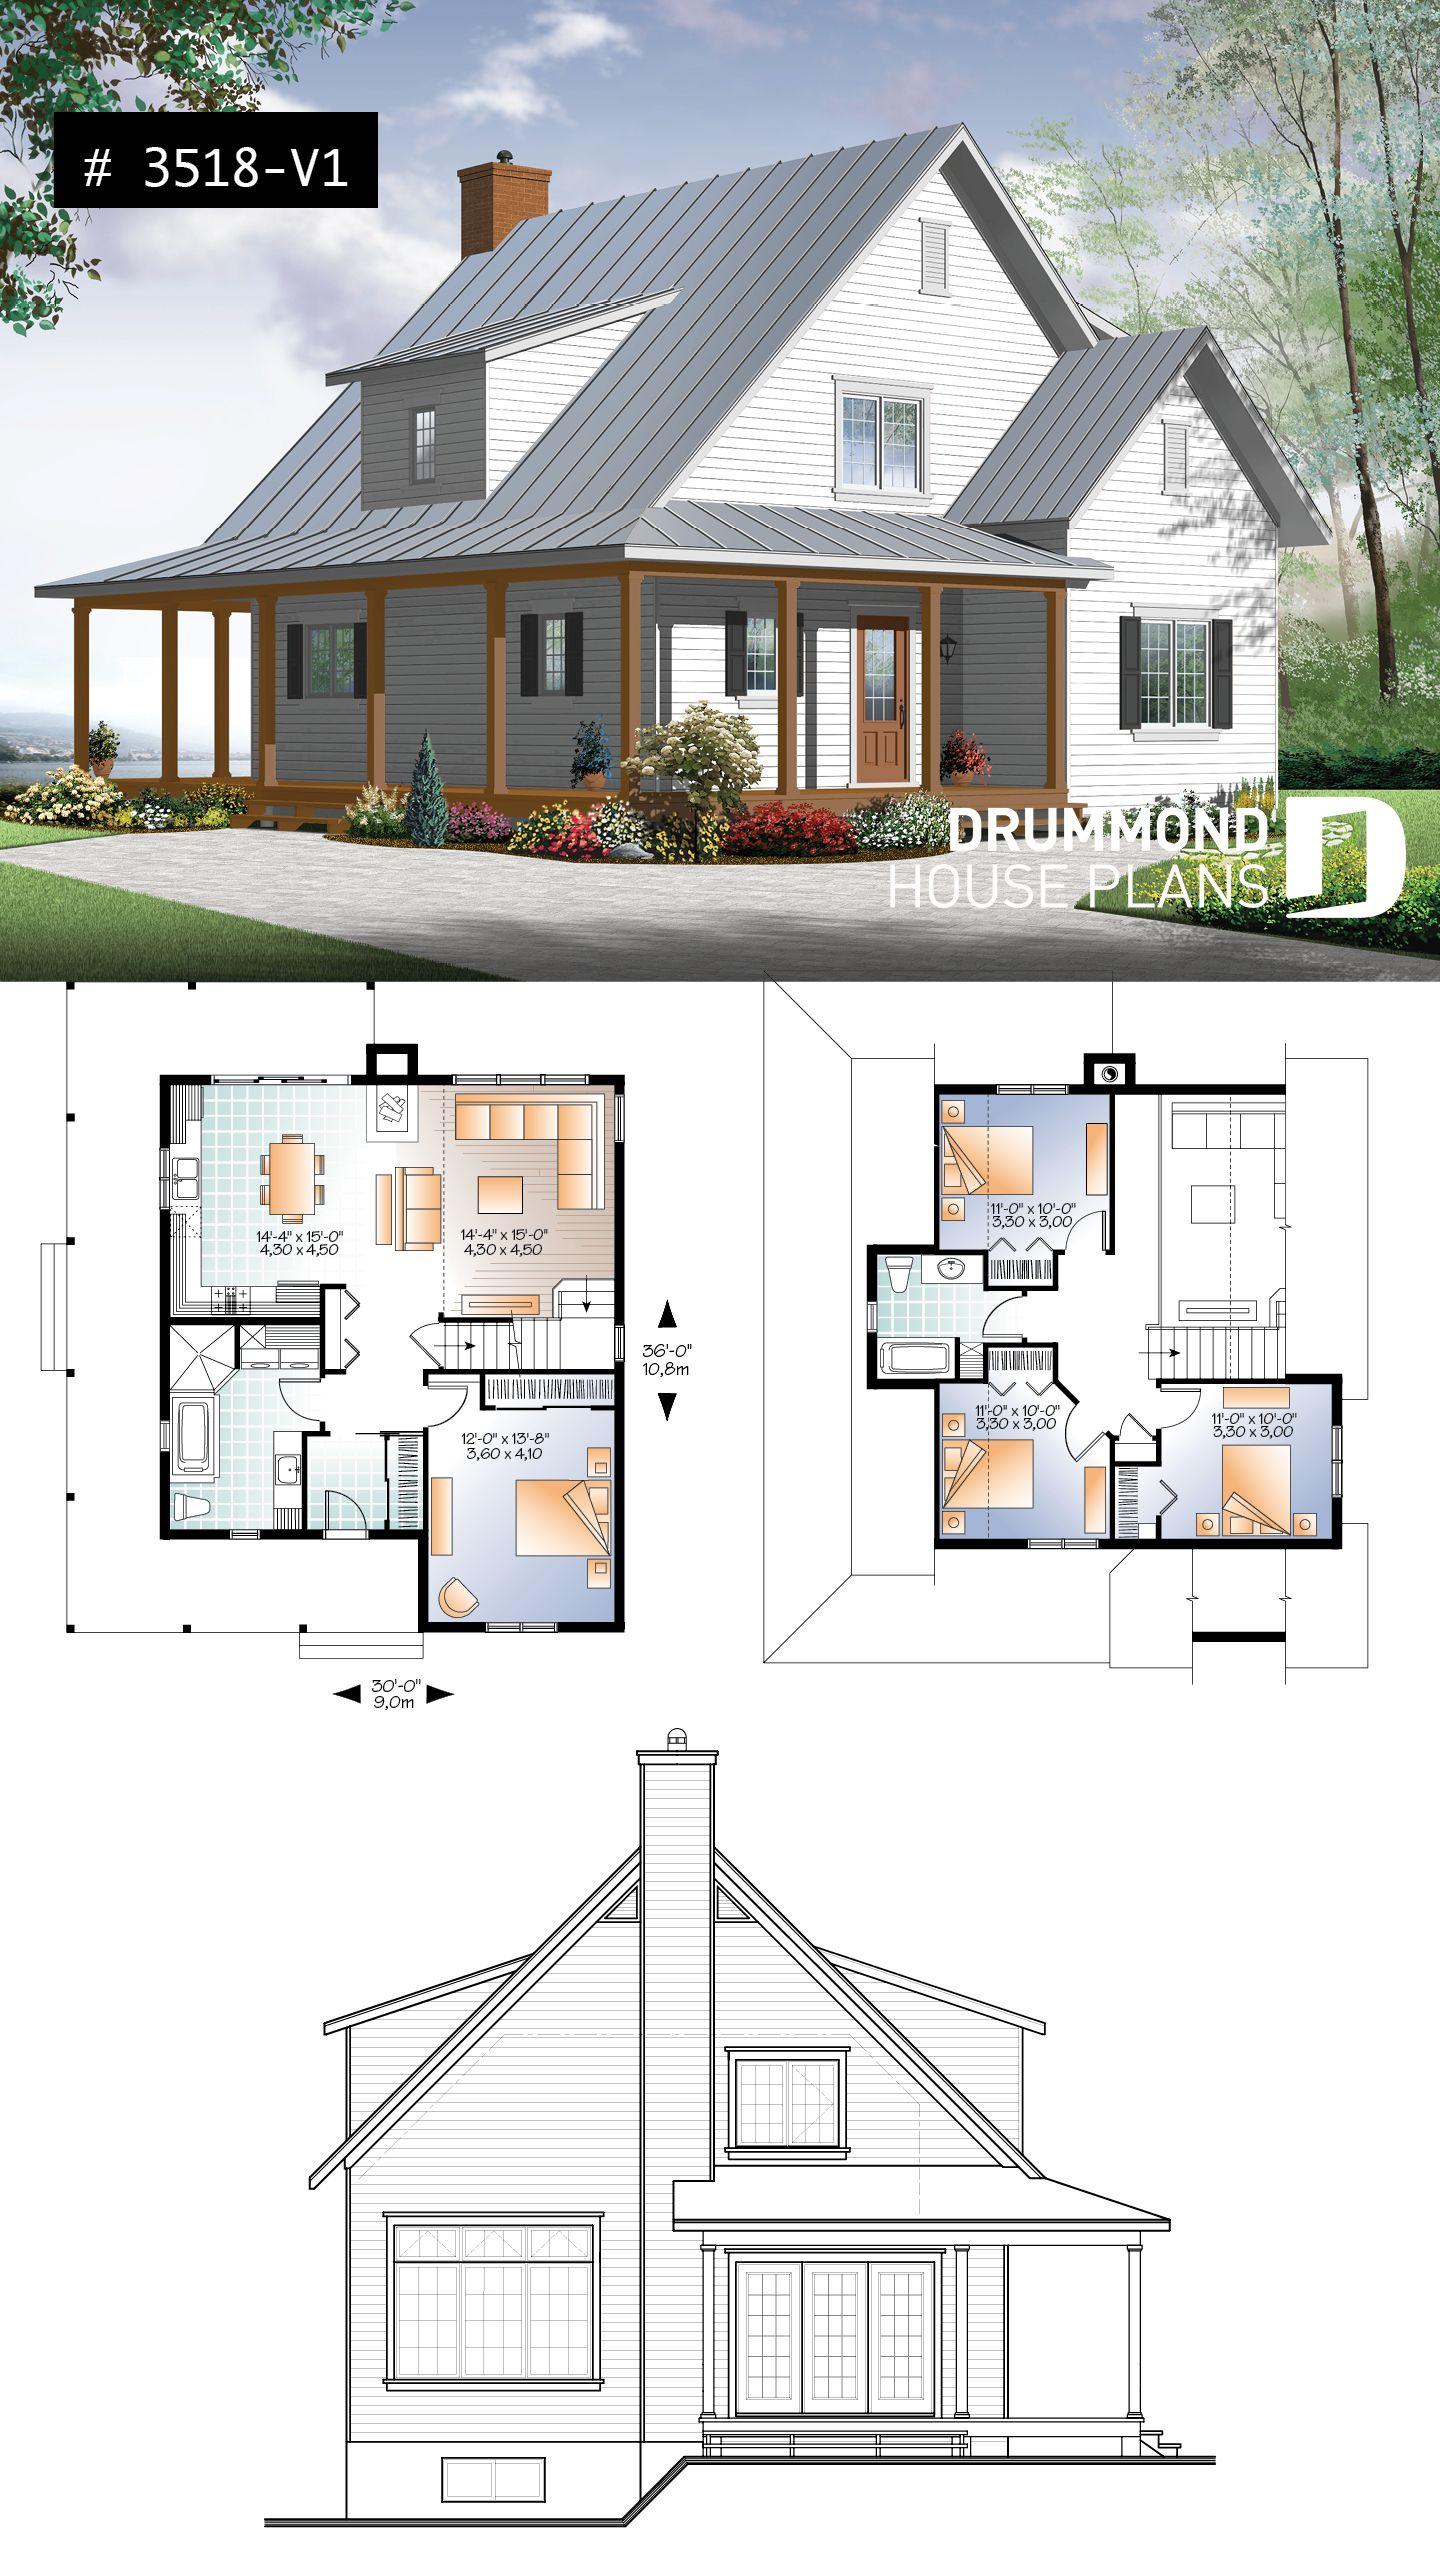 House Plan Hickory Lane 2 No 3518 V1 Affordable House Plans